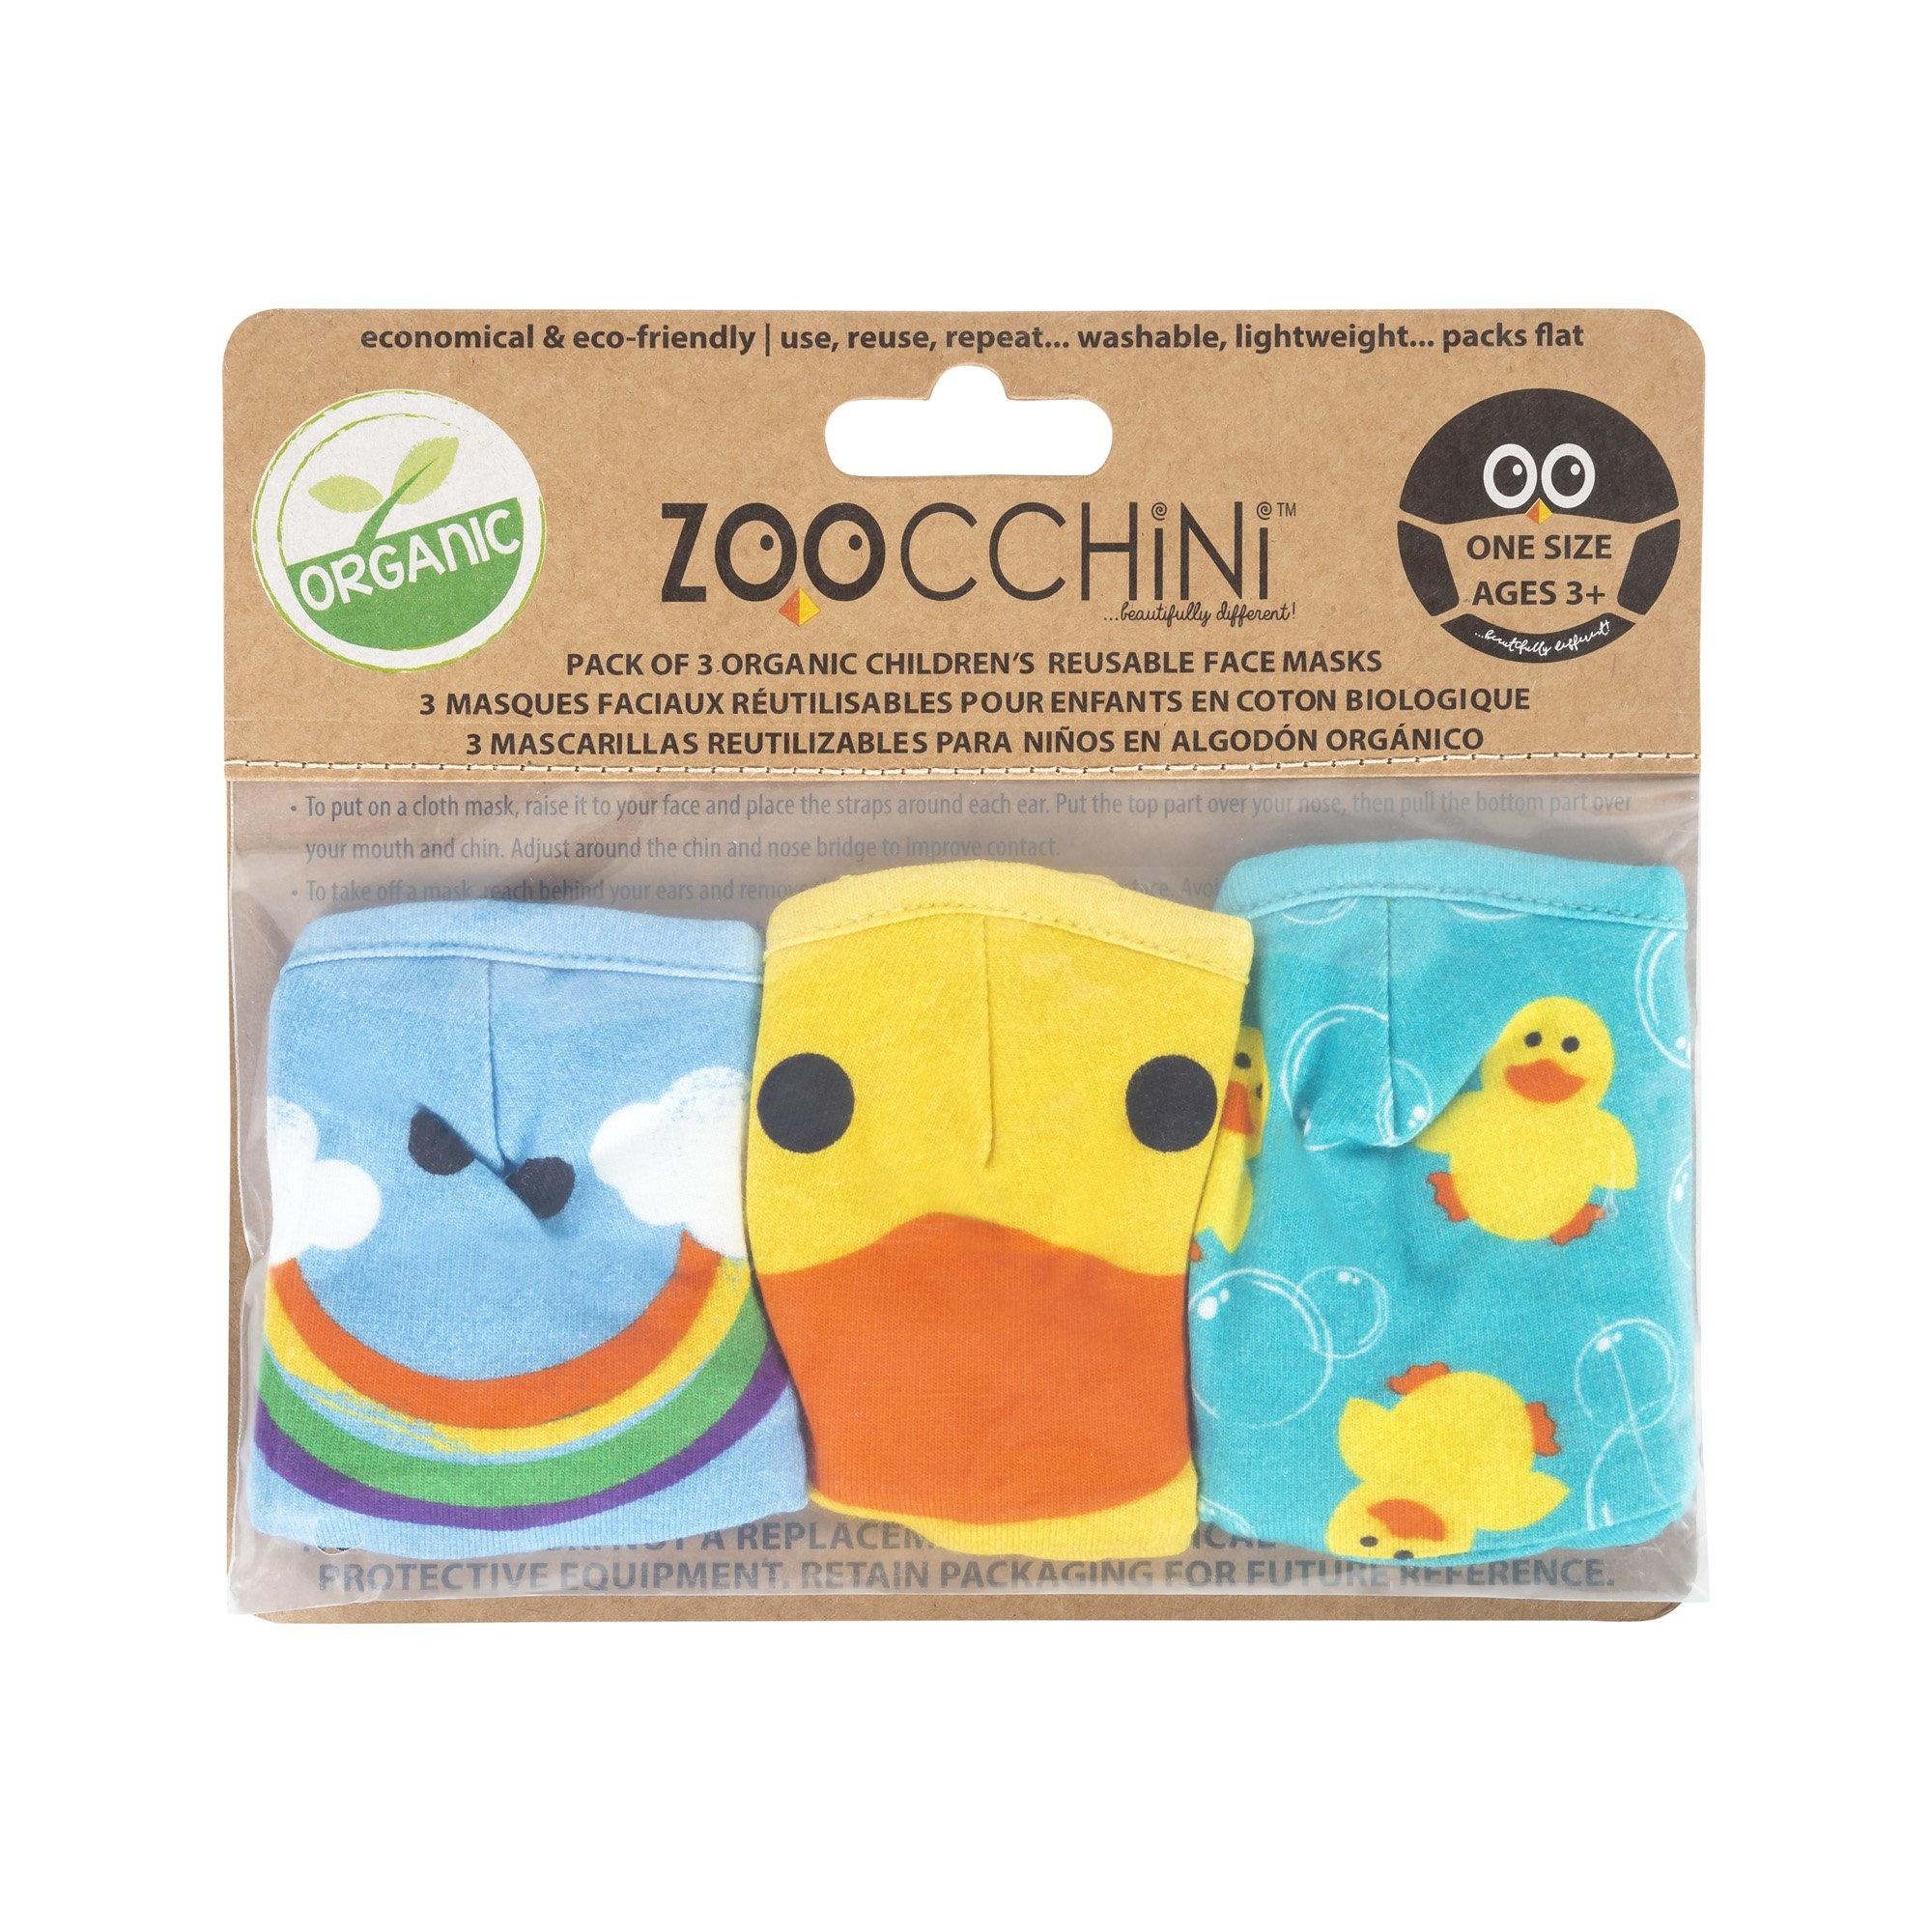 Zoochini Kids Organic Reusable Masks 3-pack (3 year+)